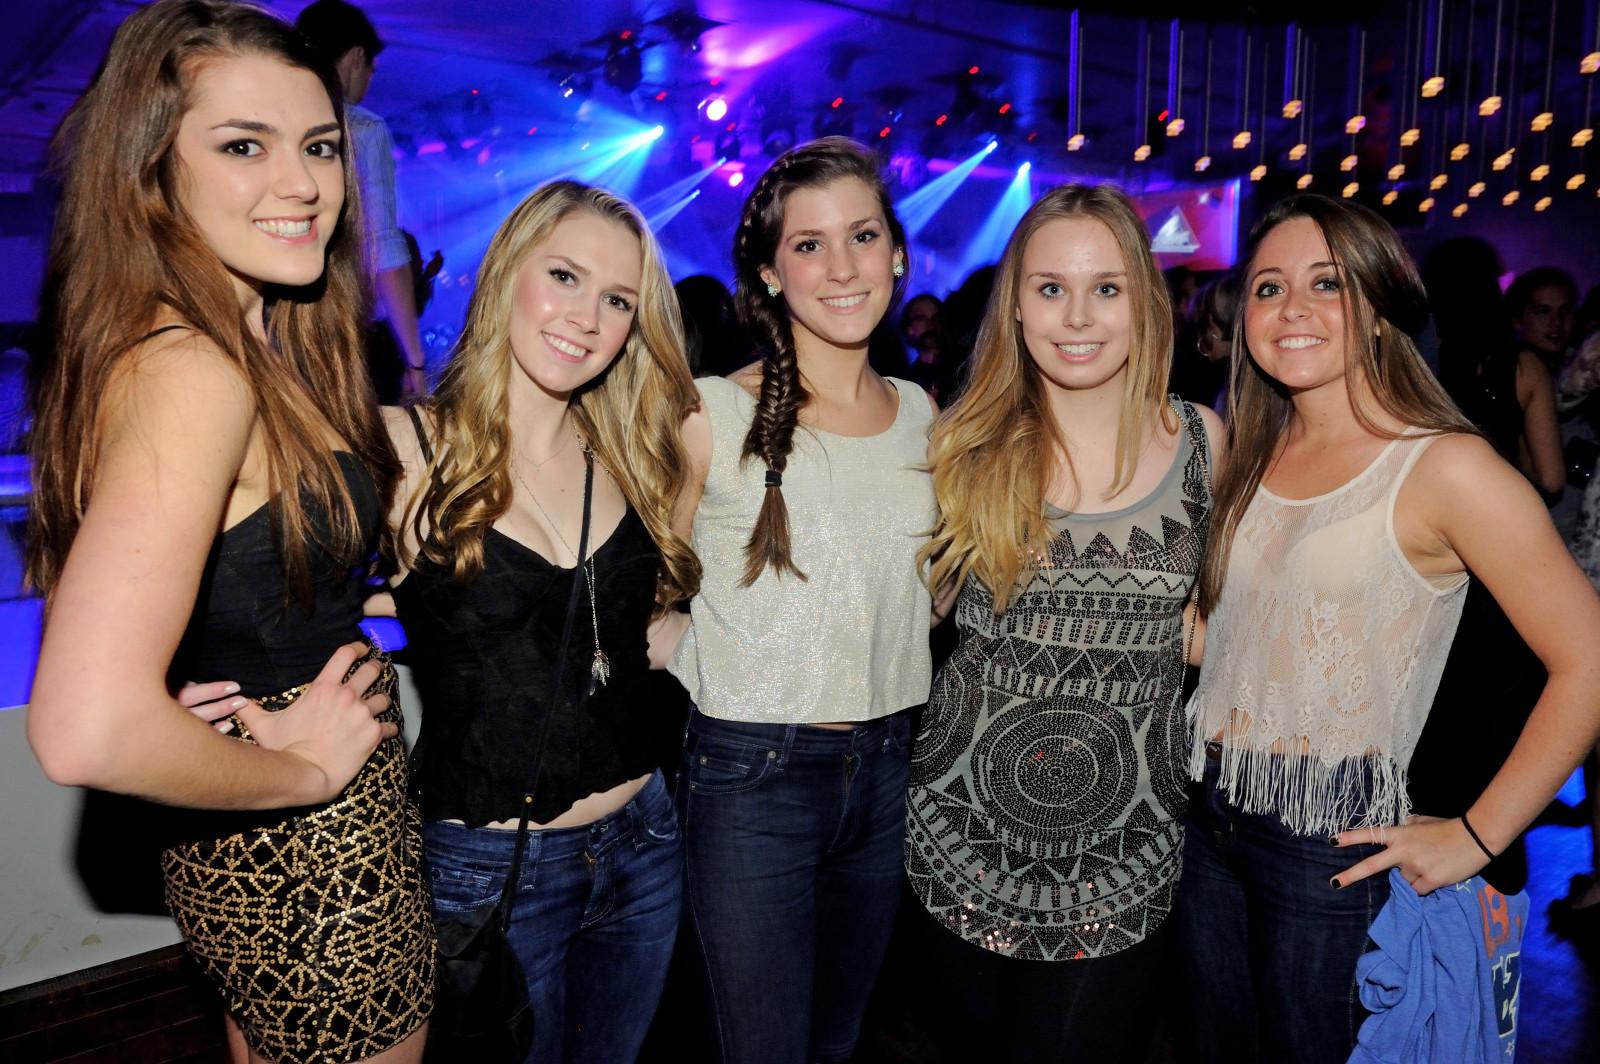 club chicas pecho